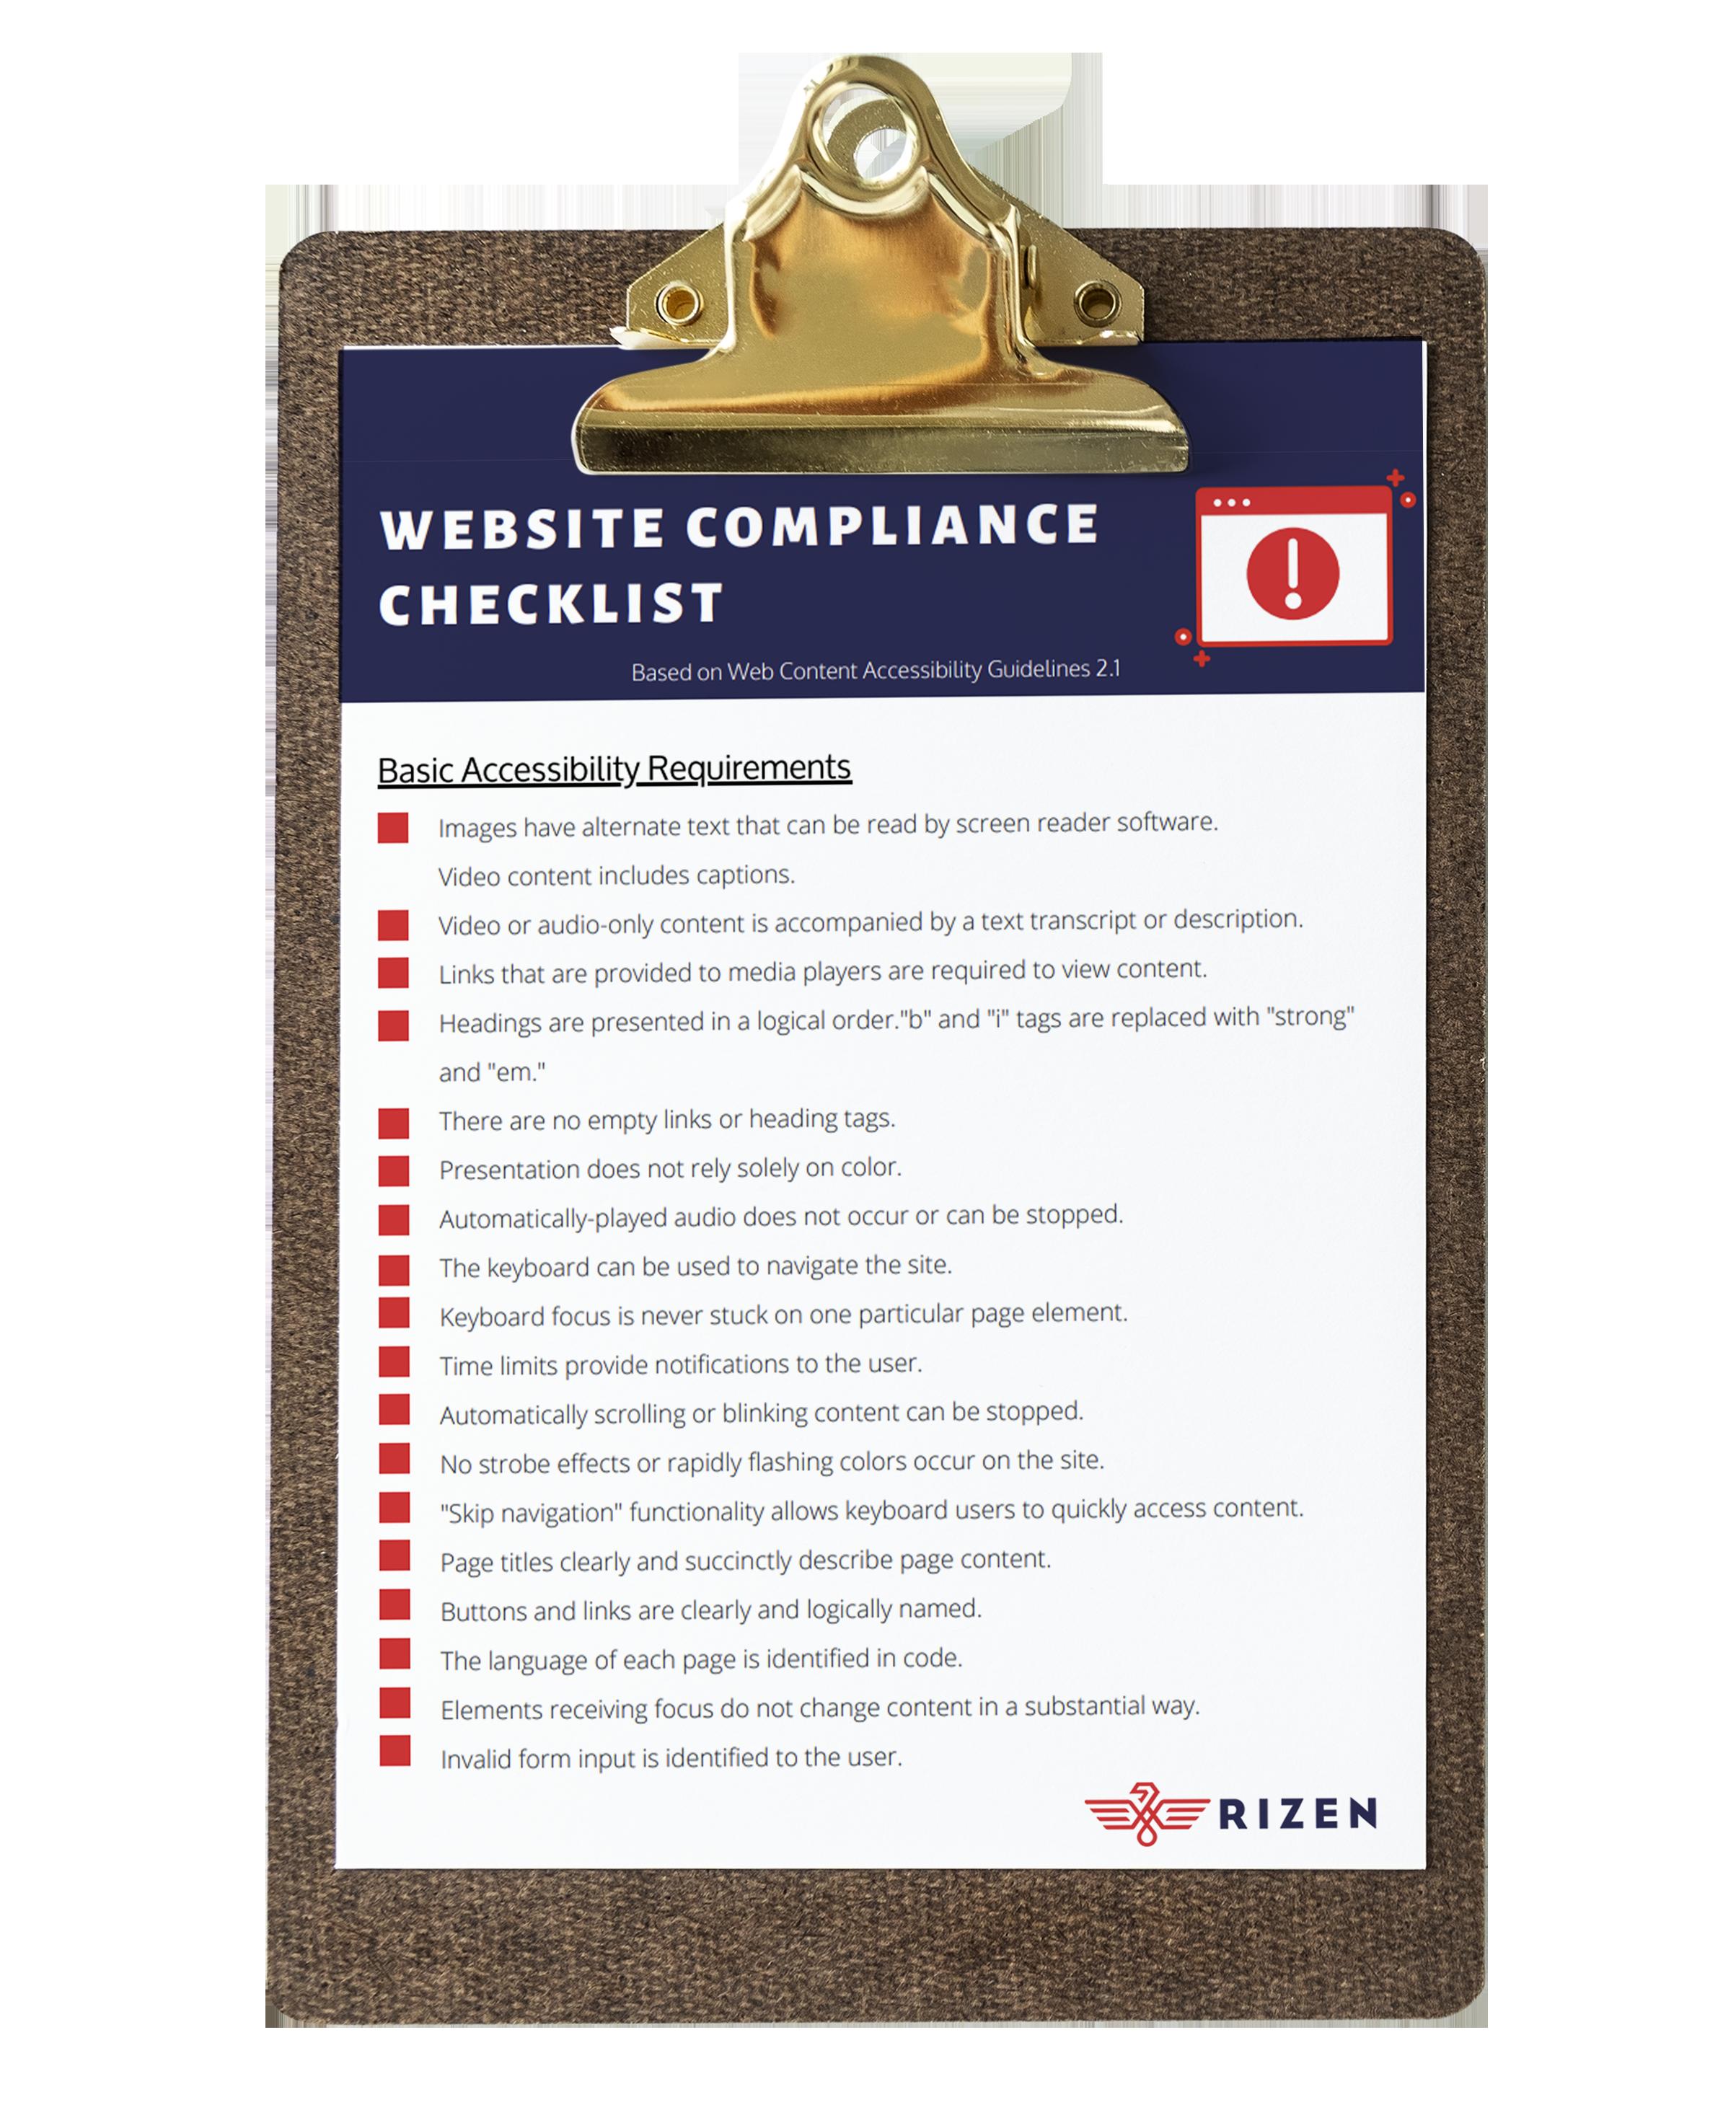 ADA checklist